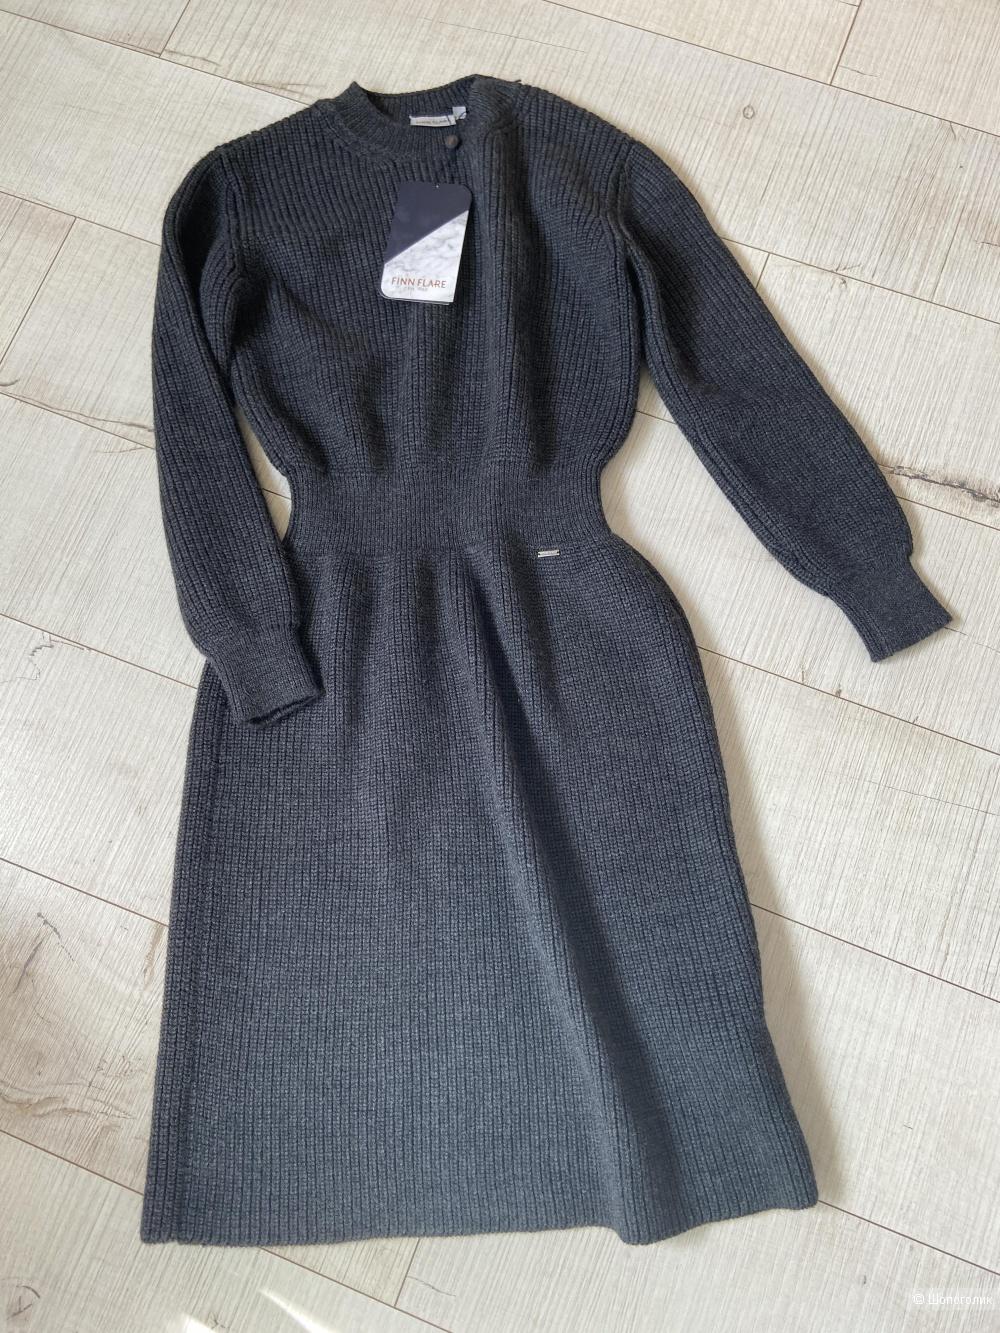 Платье Finn Flare, размер 42-44